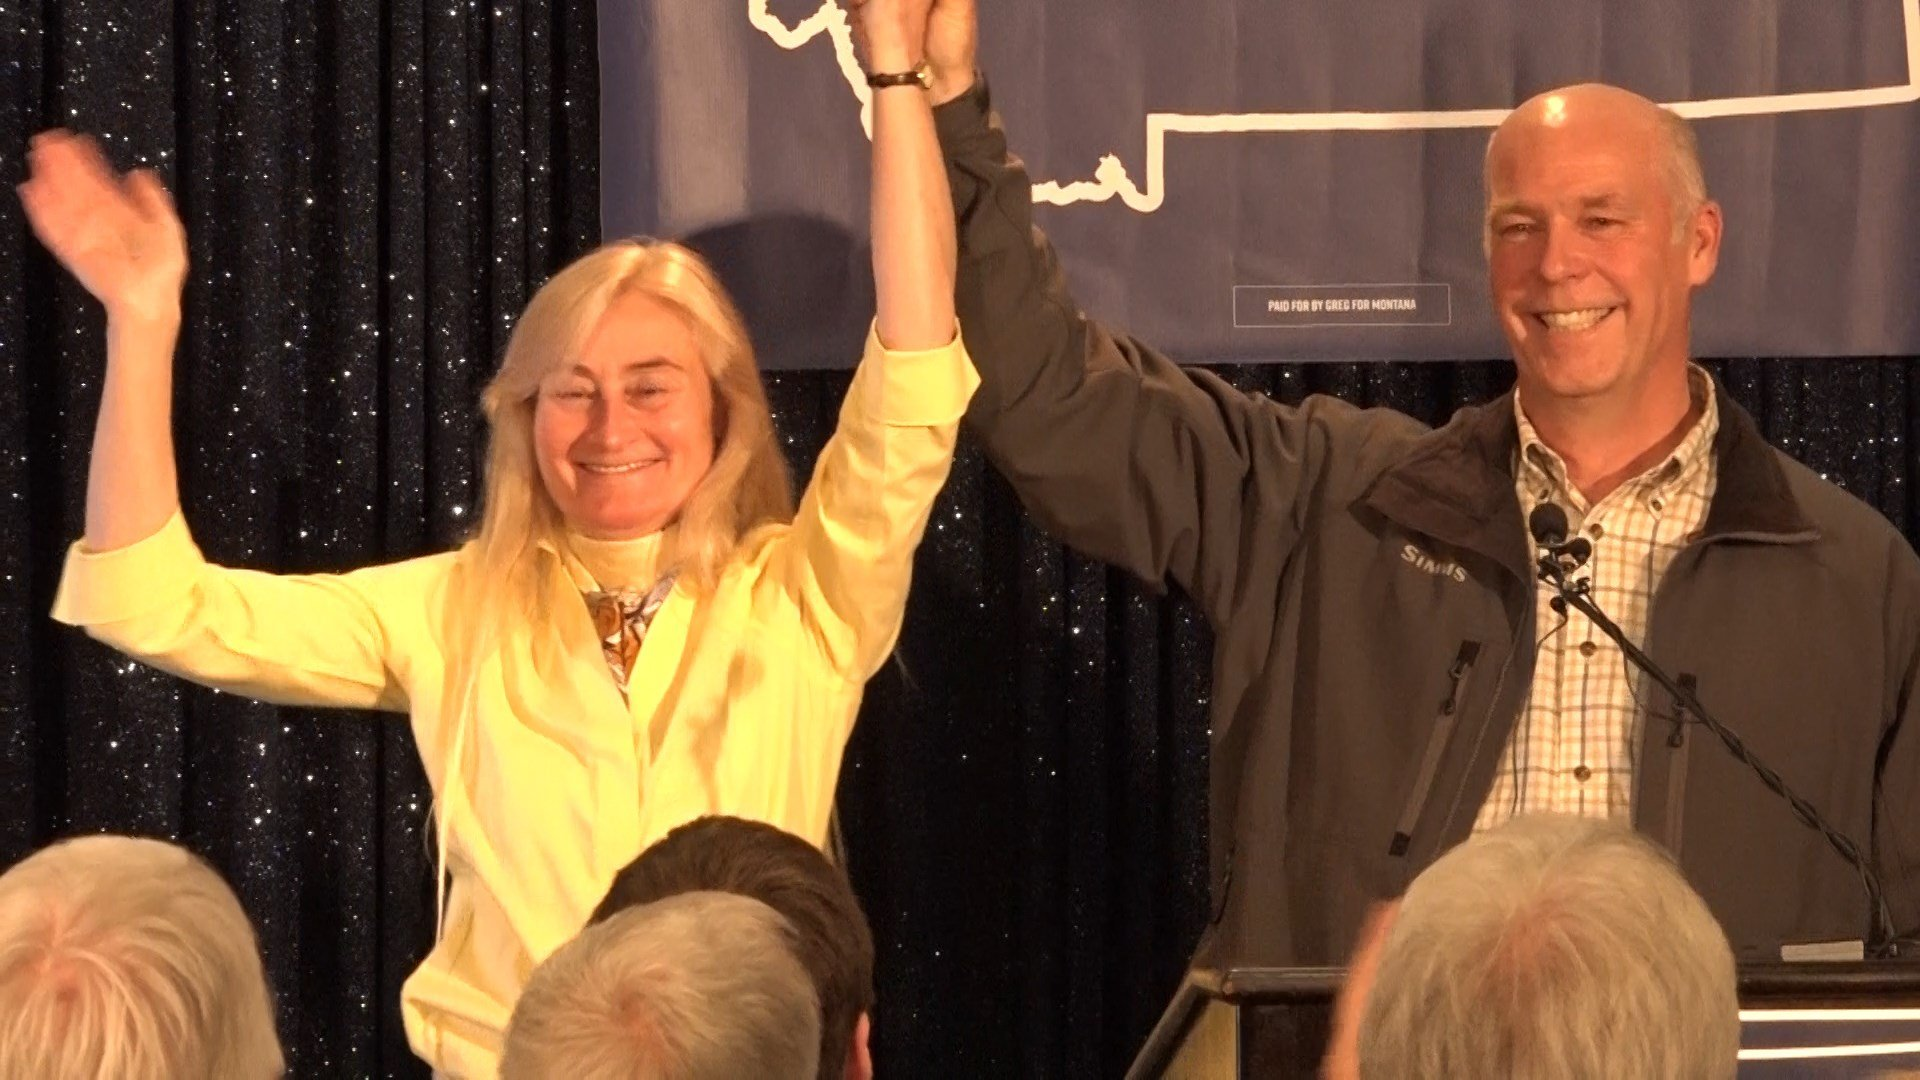 U.S. Rep.-elect Greg Gianforte and his wife Susan Thursday night